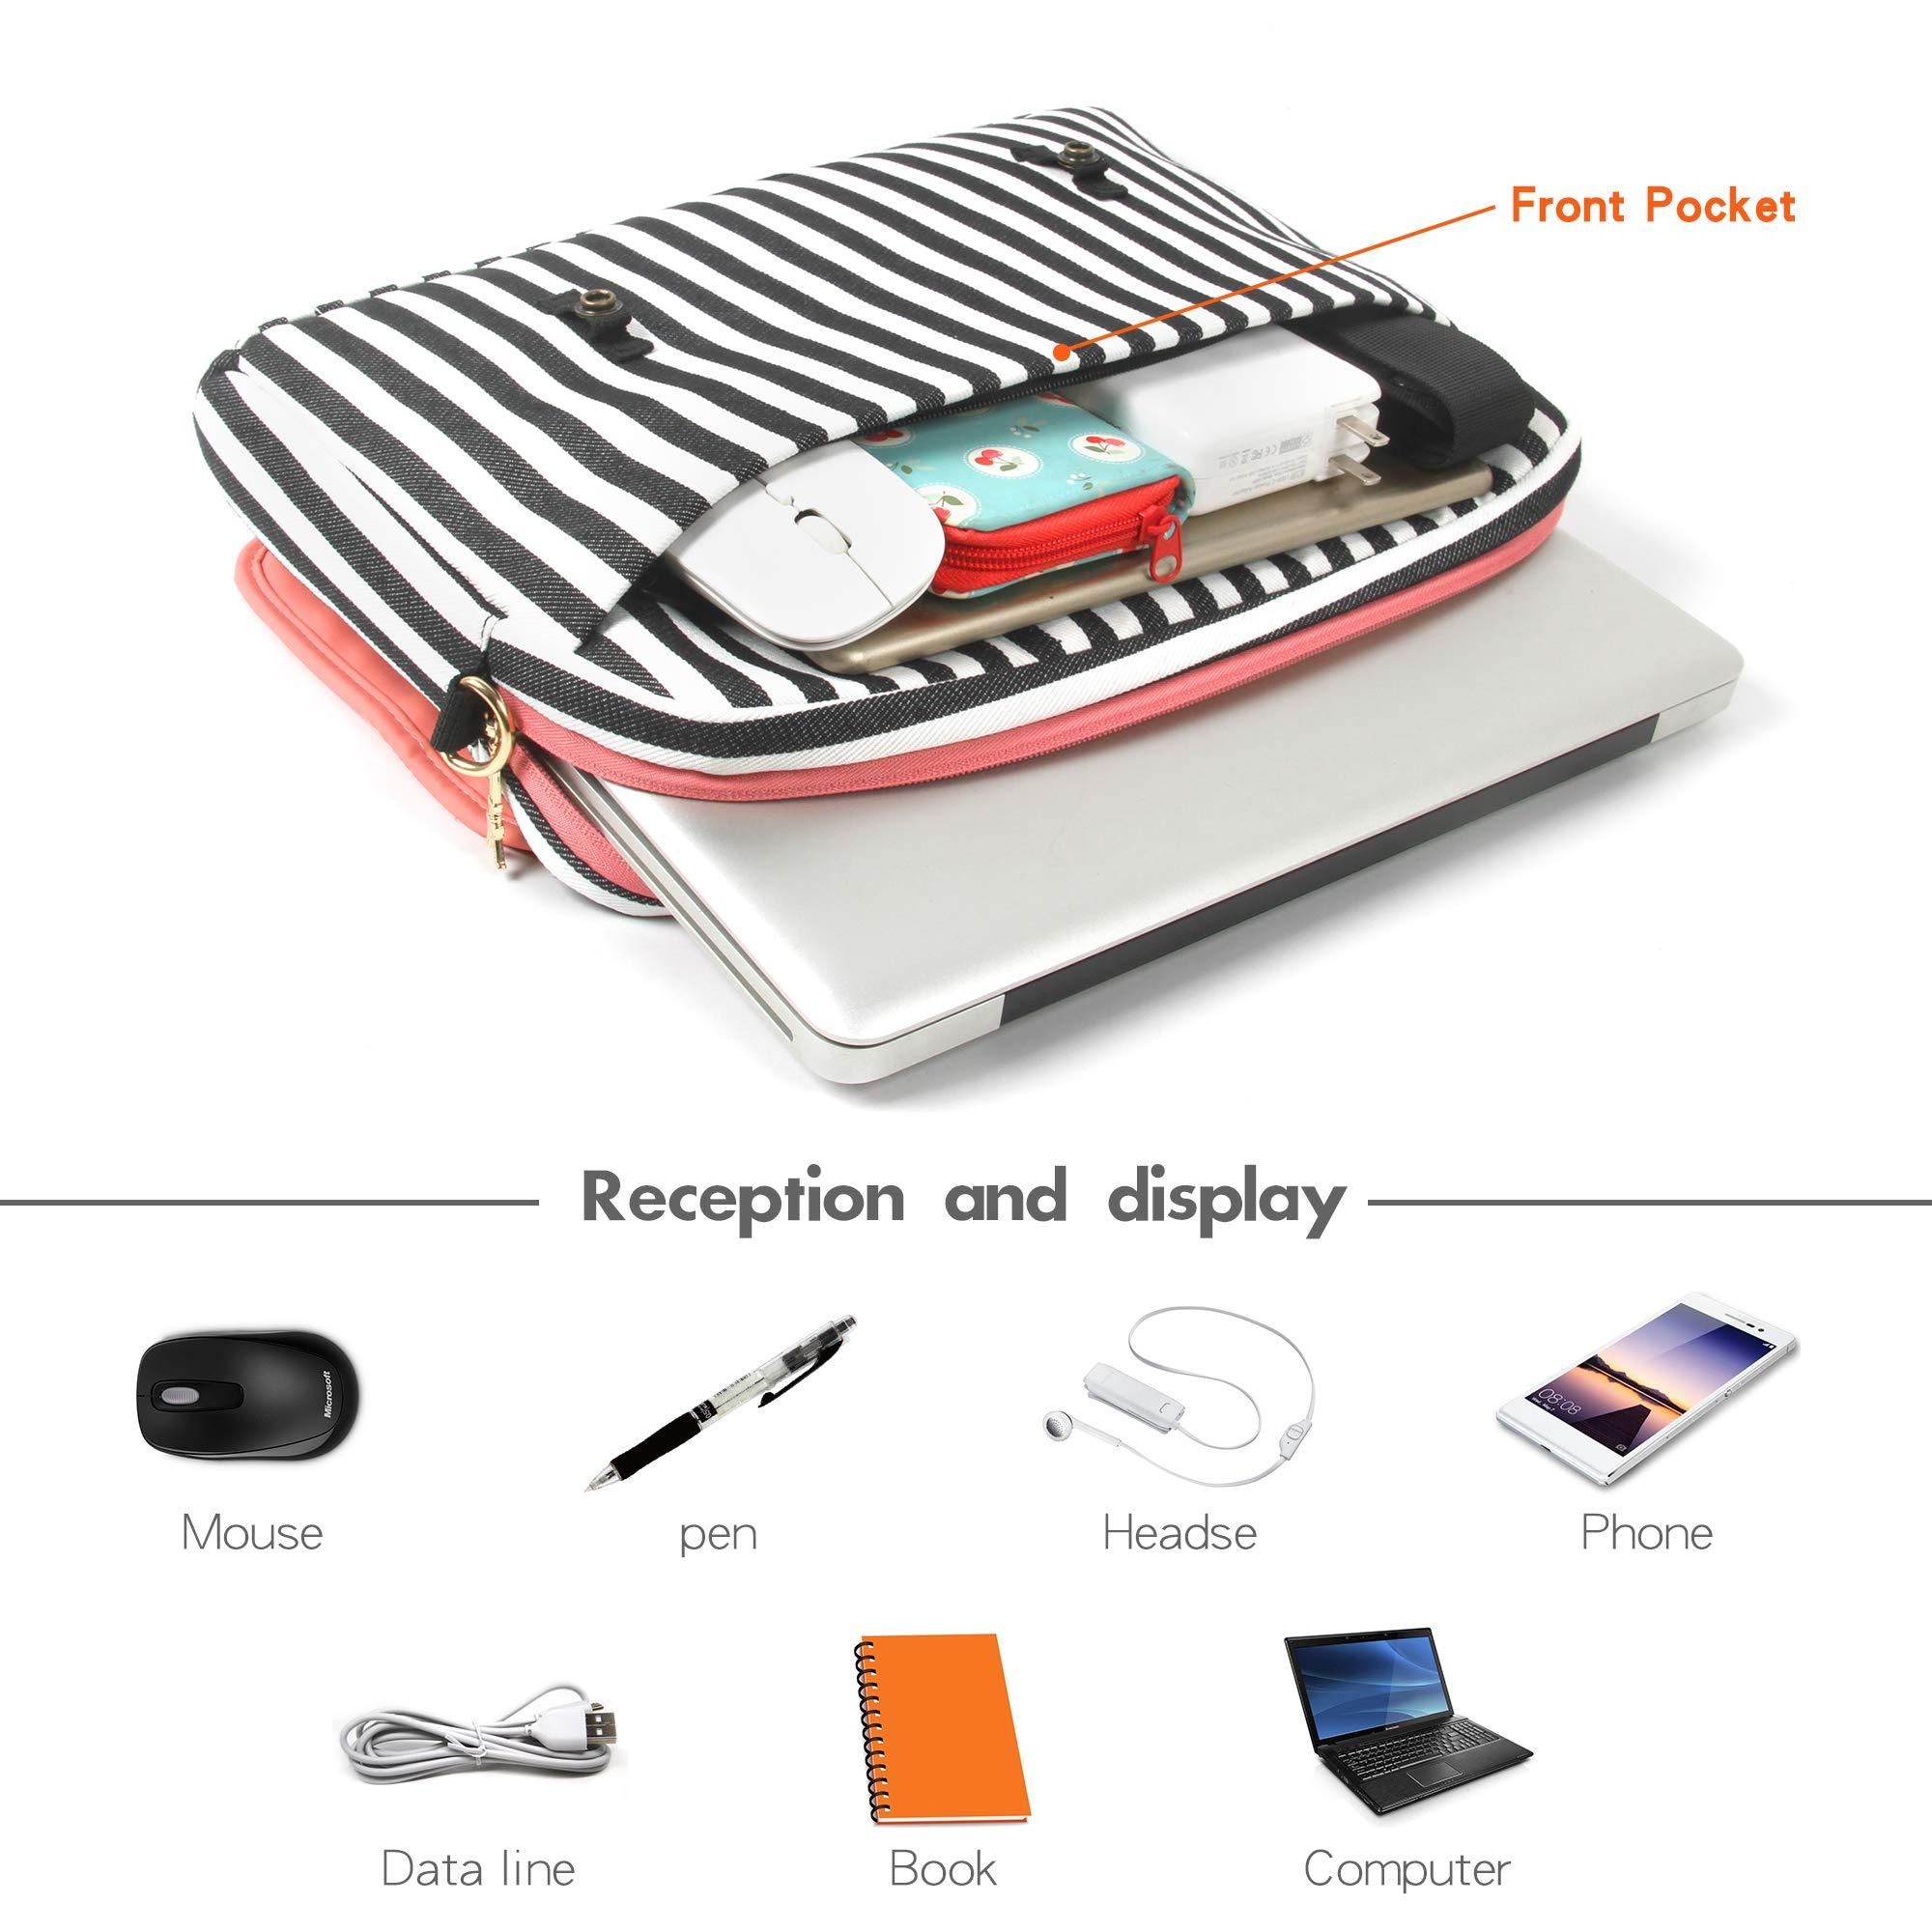 Kamlui Laptop Bag 15.6 Inch - for Women,PU Leather Canvas Shoulder Messenger Laptop Tote Bag Briefcase-for MacBook Air Dell Lenovo HP Samsung - Laptop Computer Case. by Kamlui (Image #6)